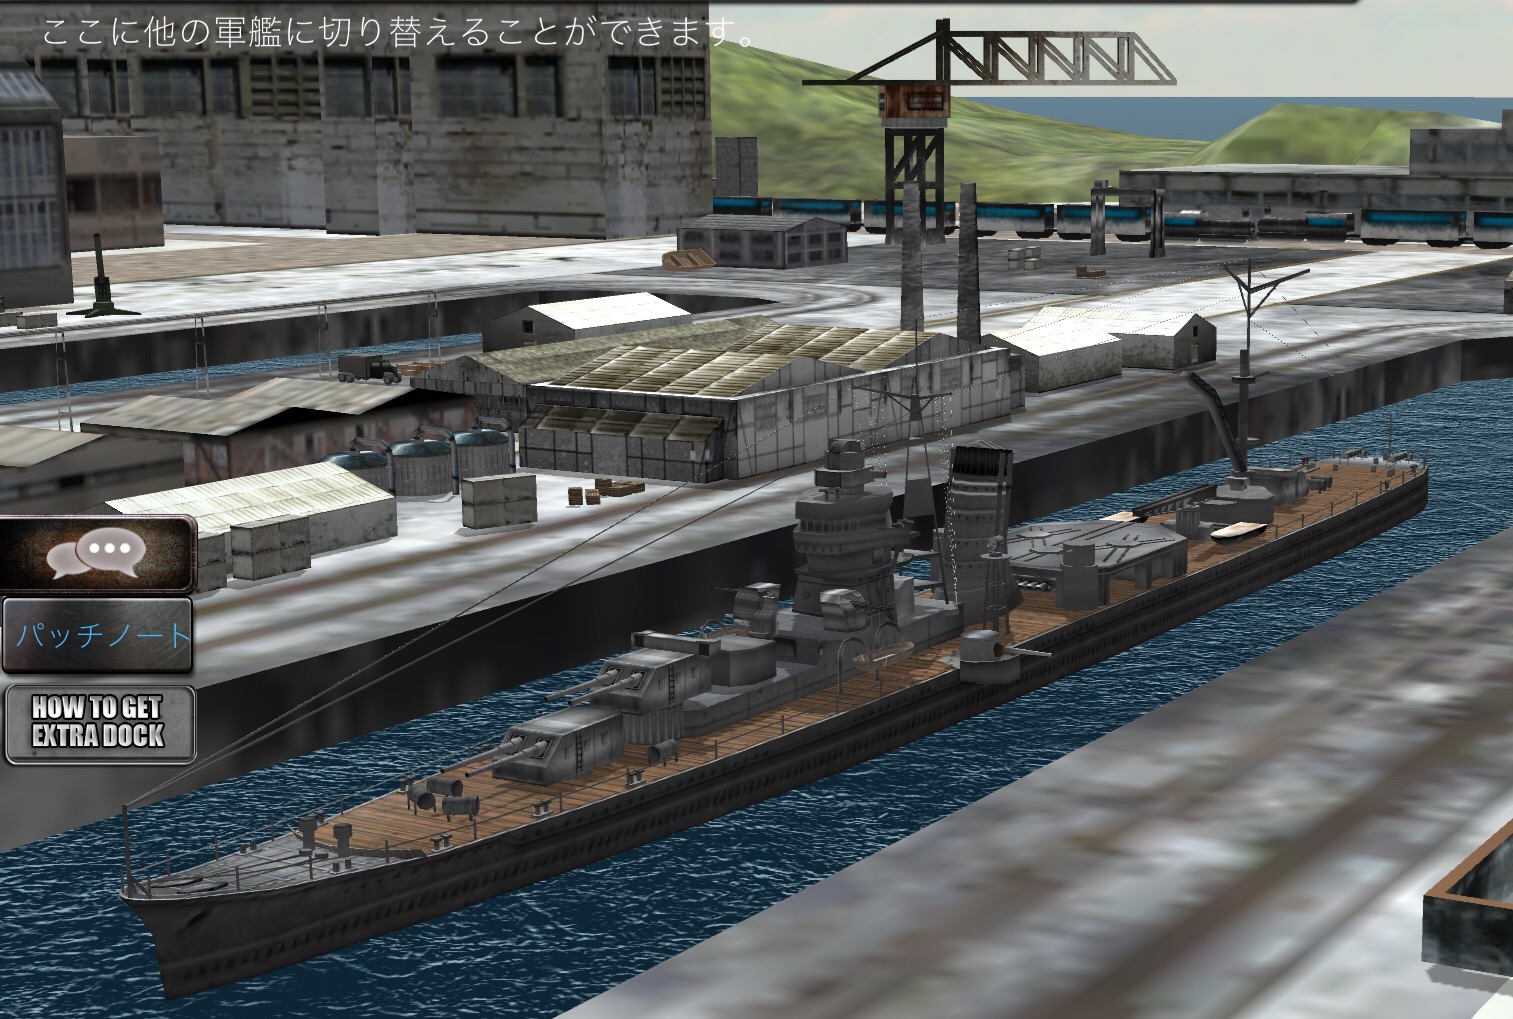 阿賀野型軽巡洋艦 - Naval Front...